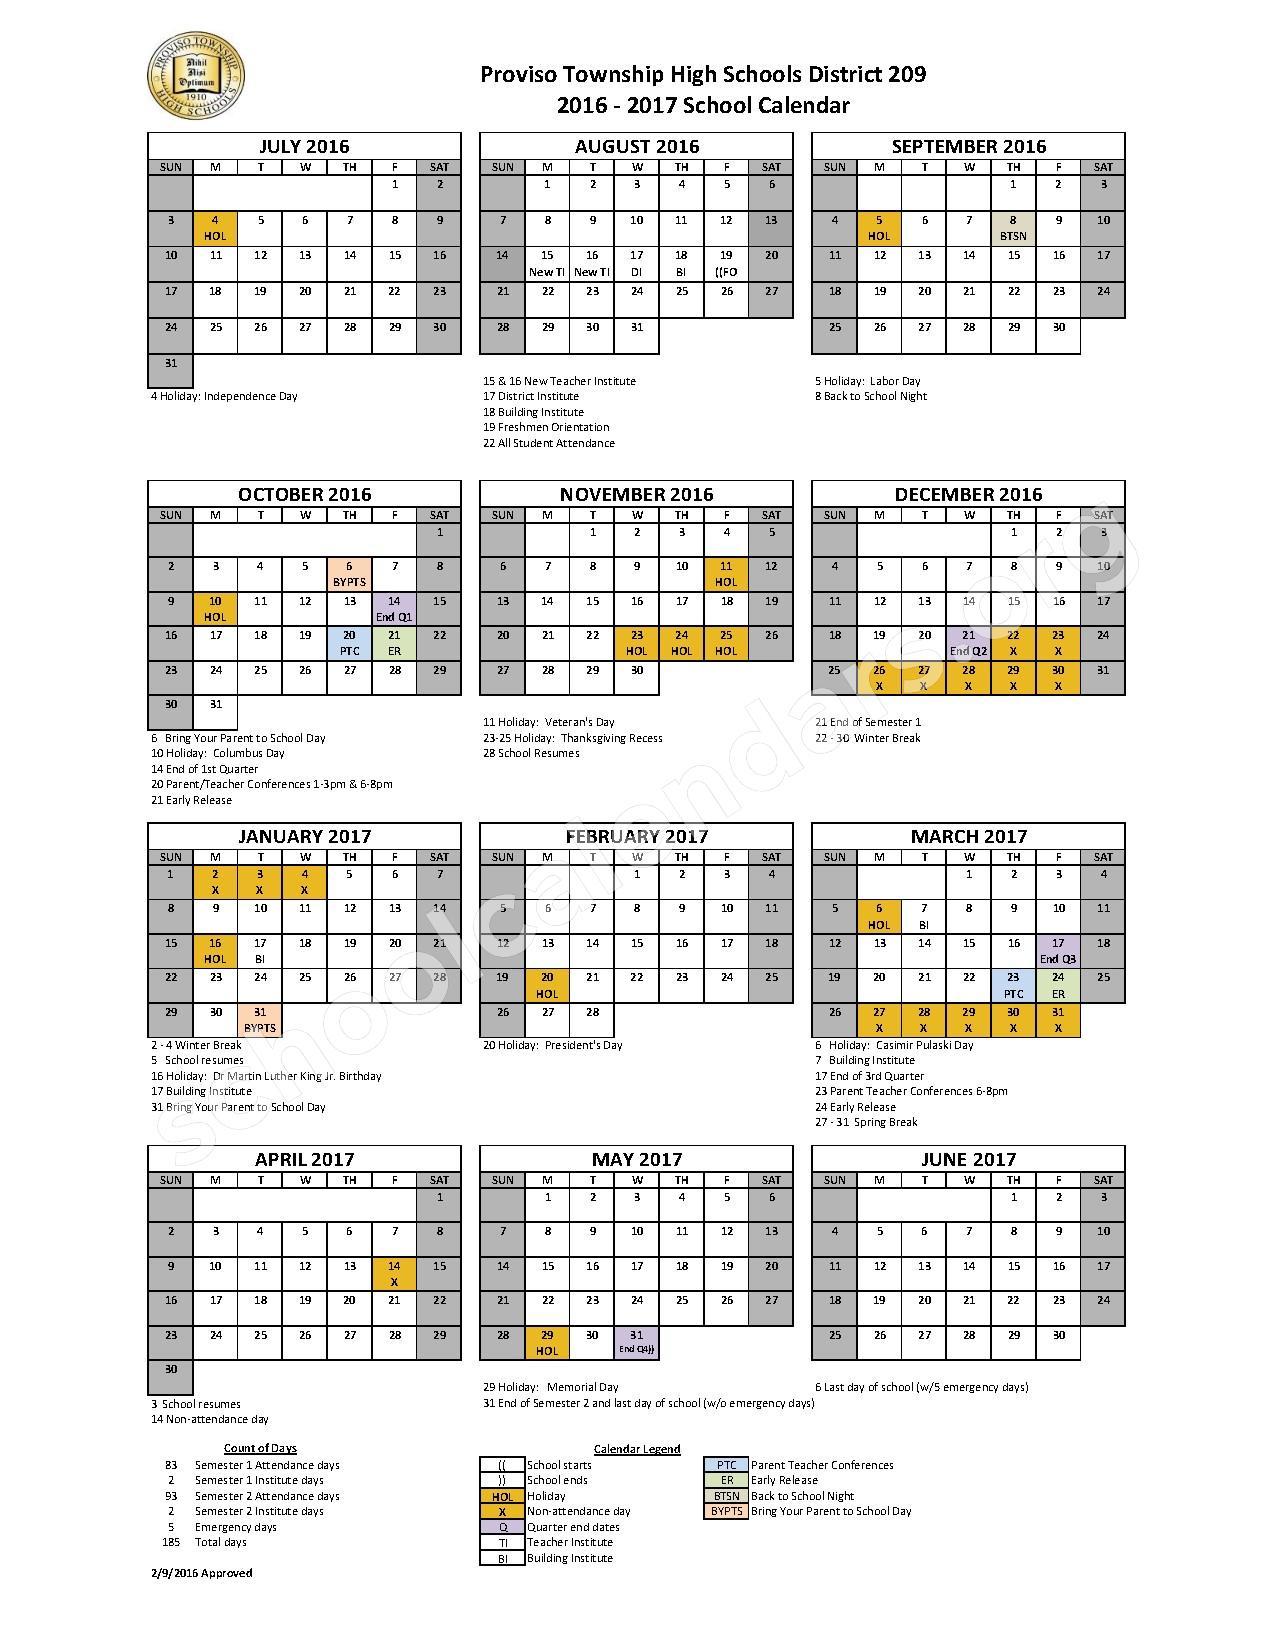 2016 - 2017 PTHS 209 District Calendar – Proviso Township High Schools District 209 – page 1